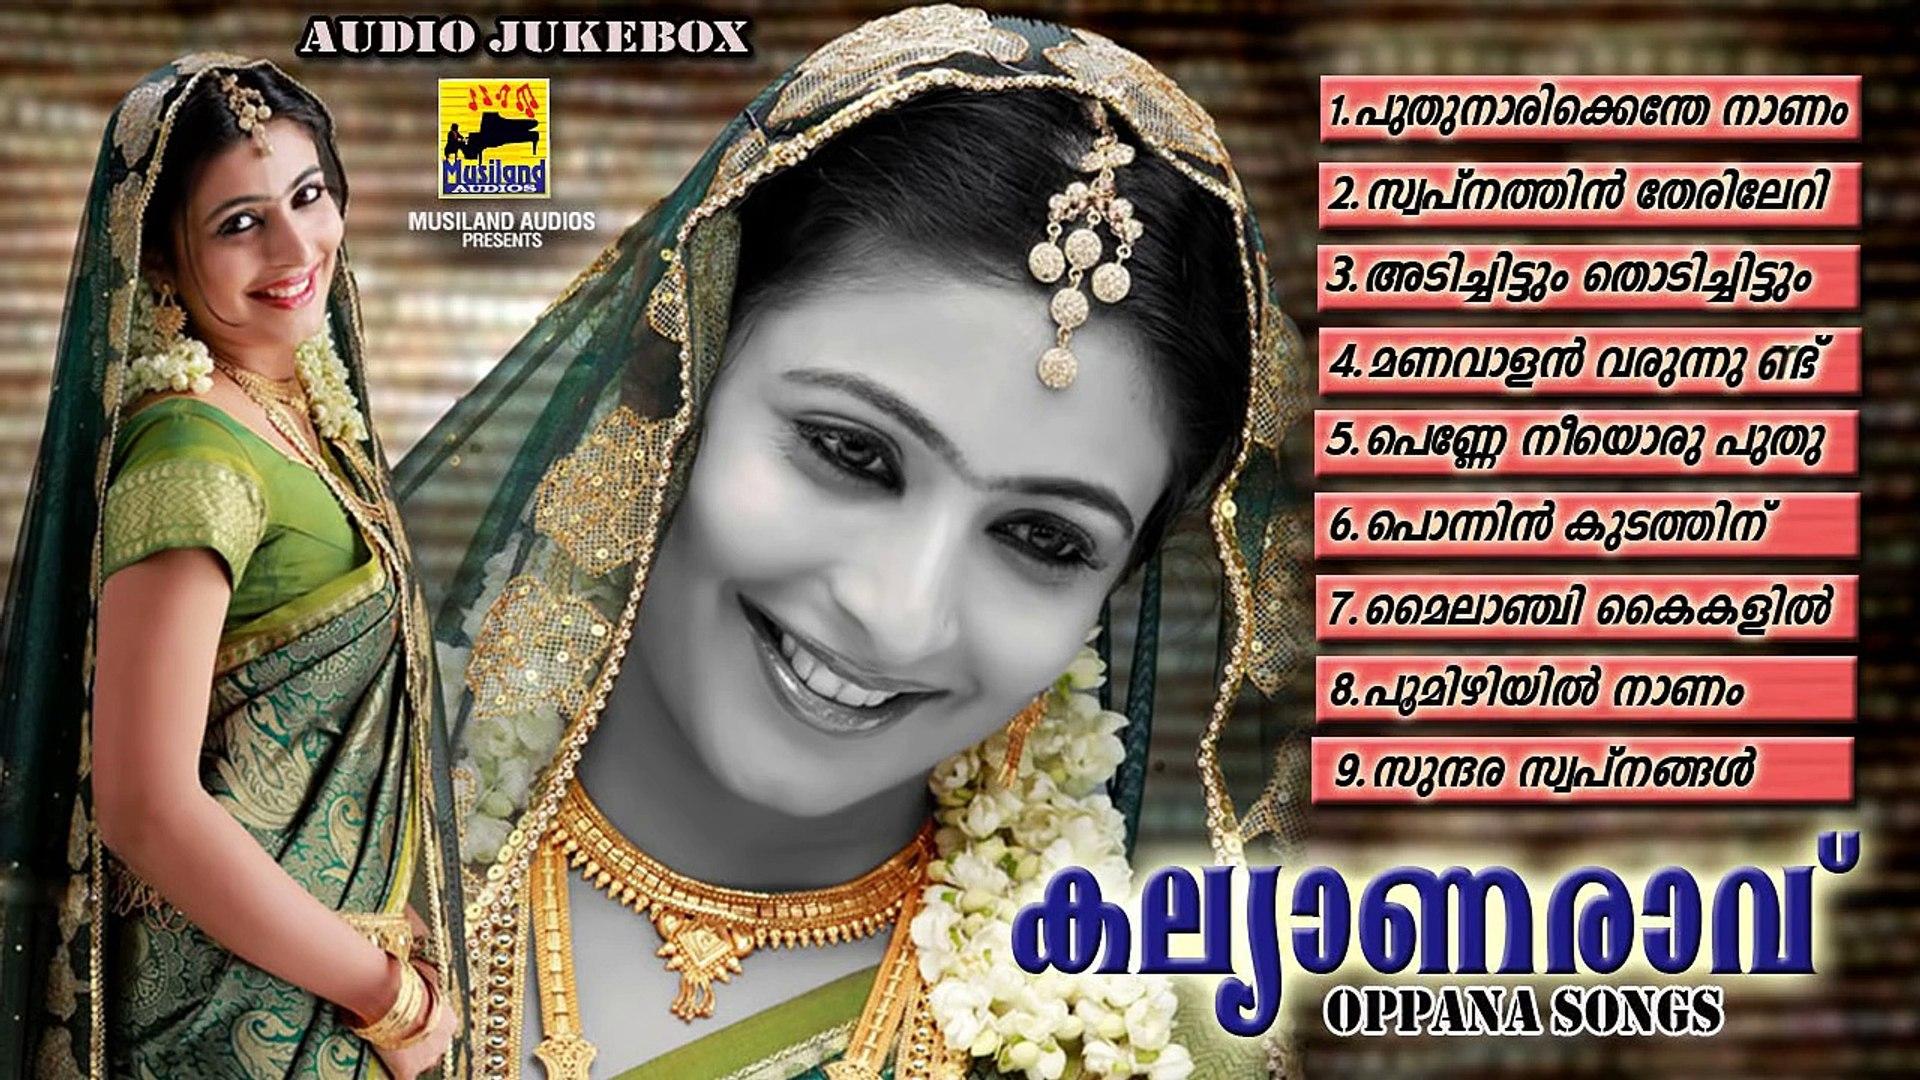 oppana songs by chitra